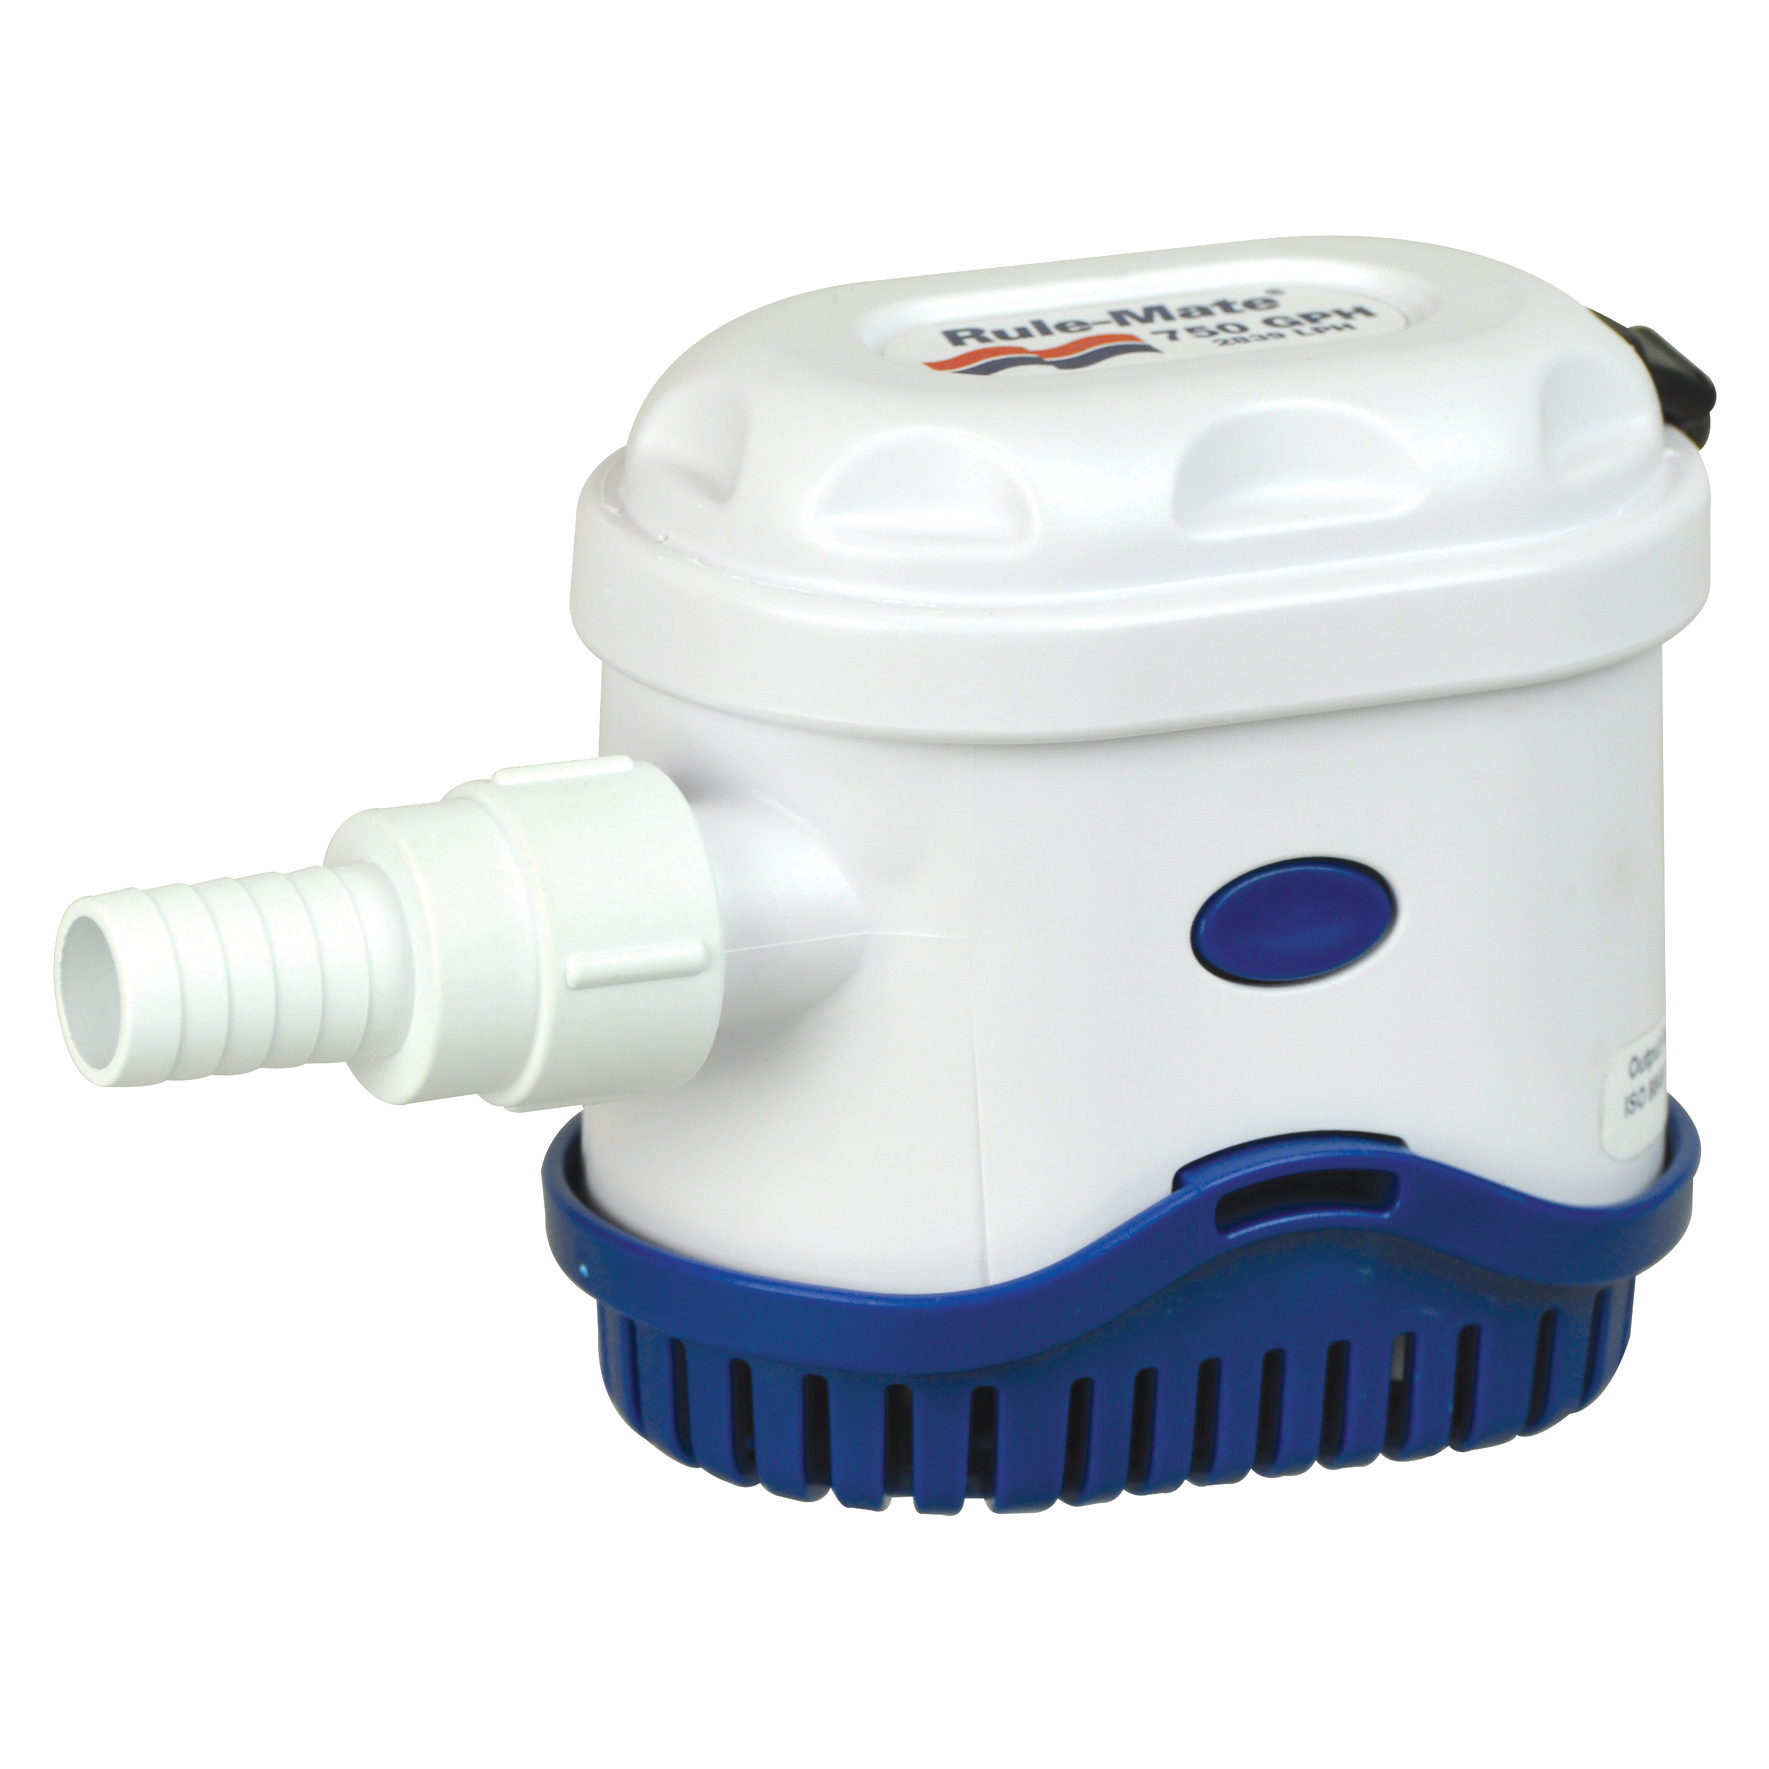 Rule-Mate Automatic Bilge Pump RM500 - 500 GPH